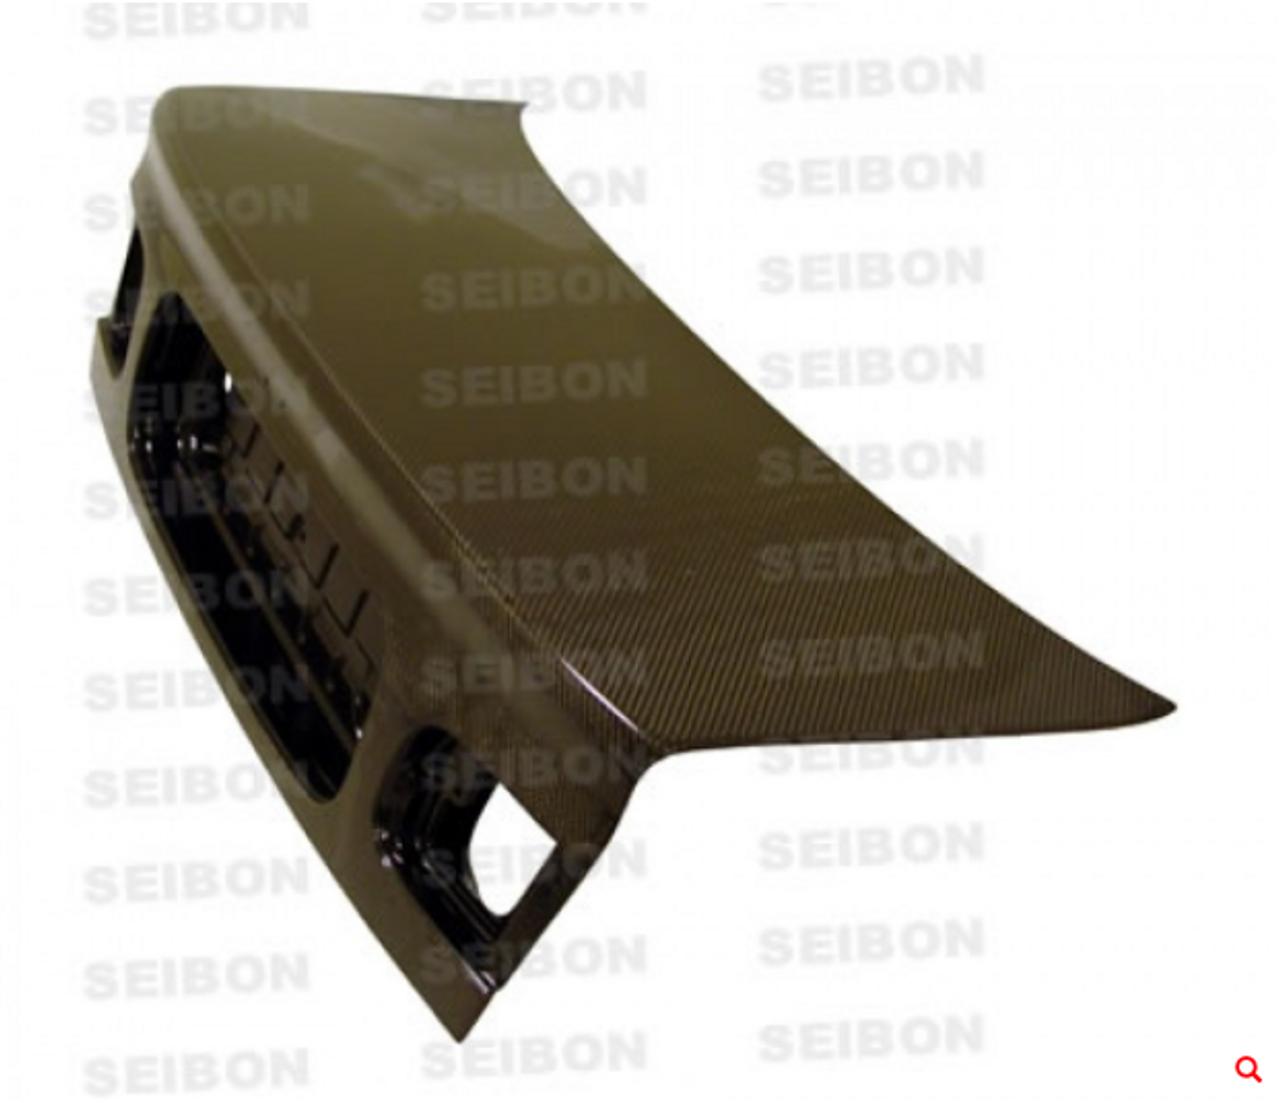 Seibon - OEM-STYLE CARBON FIBER TRUNK LID FOR 1992-1995 HONDA CIVIC 2DR